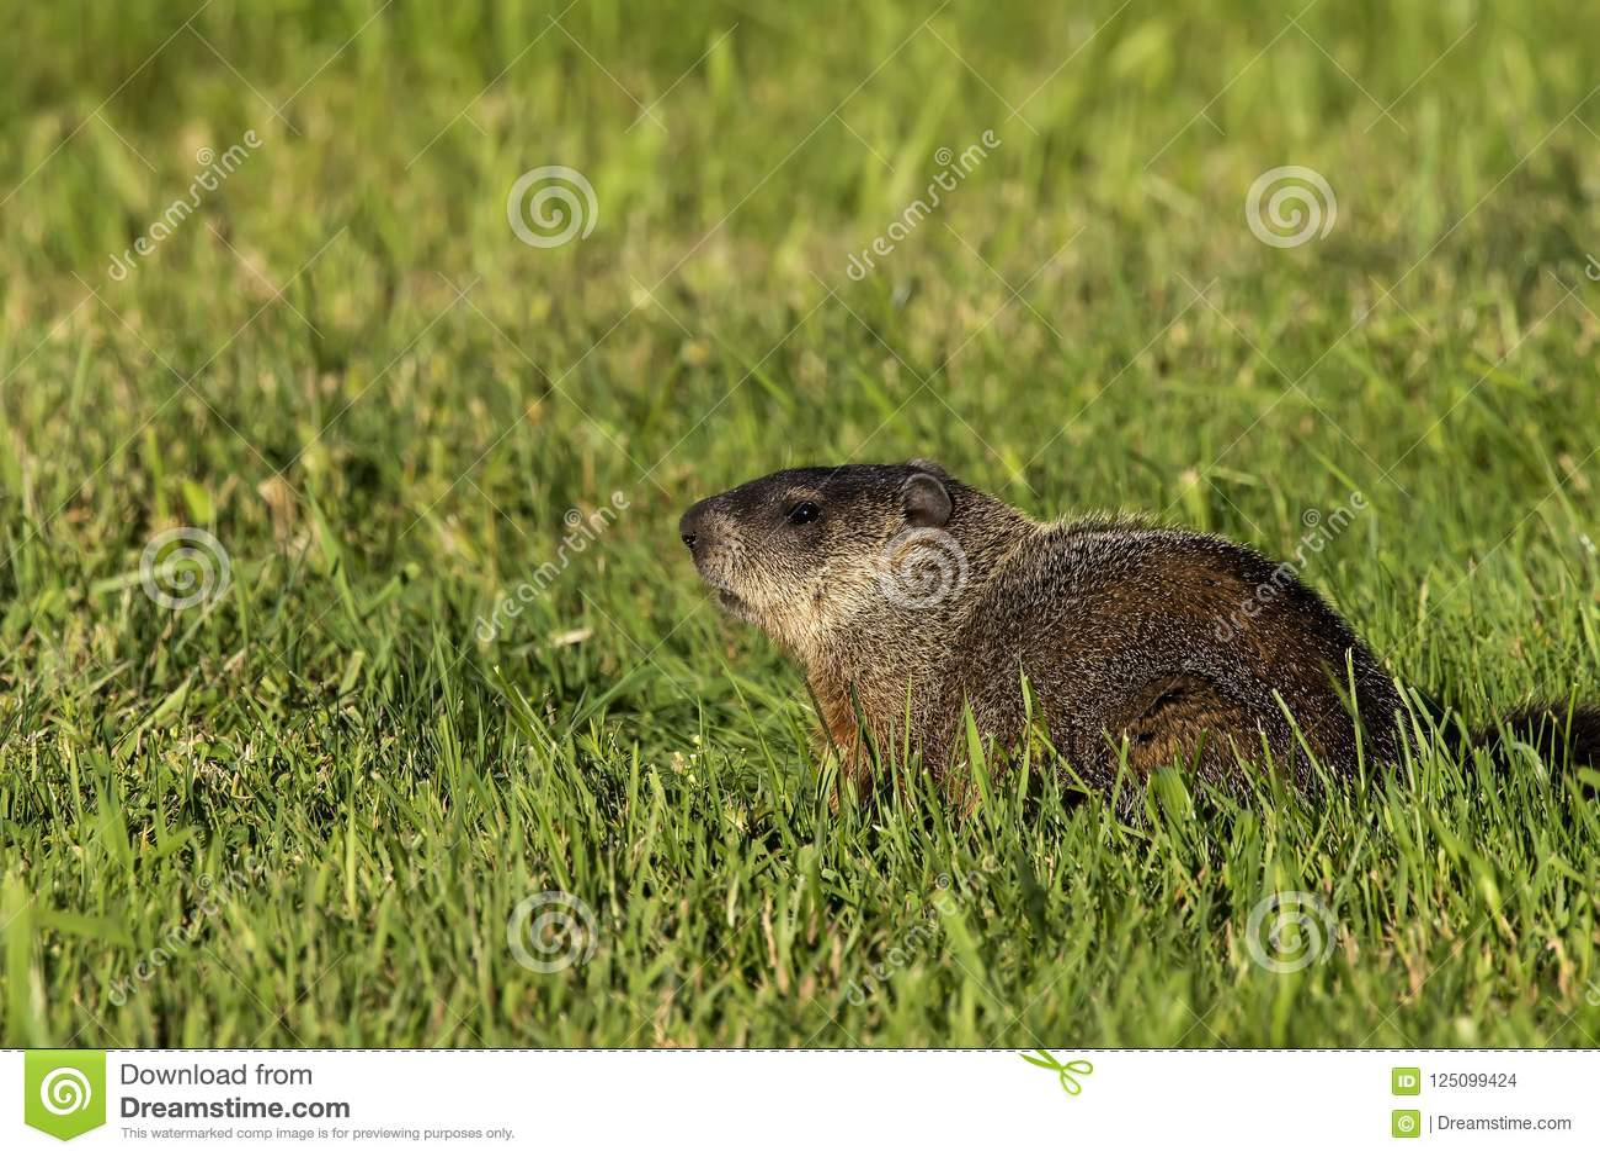 The groundhog Marmota monax woodchuck